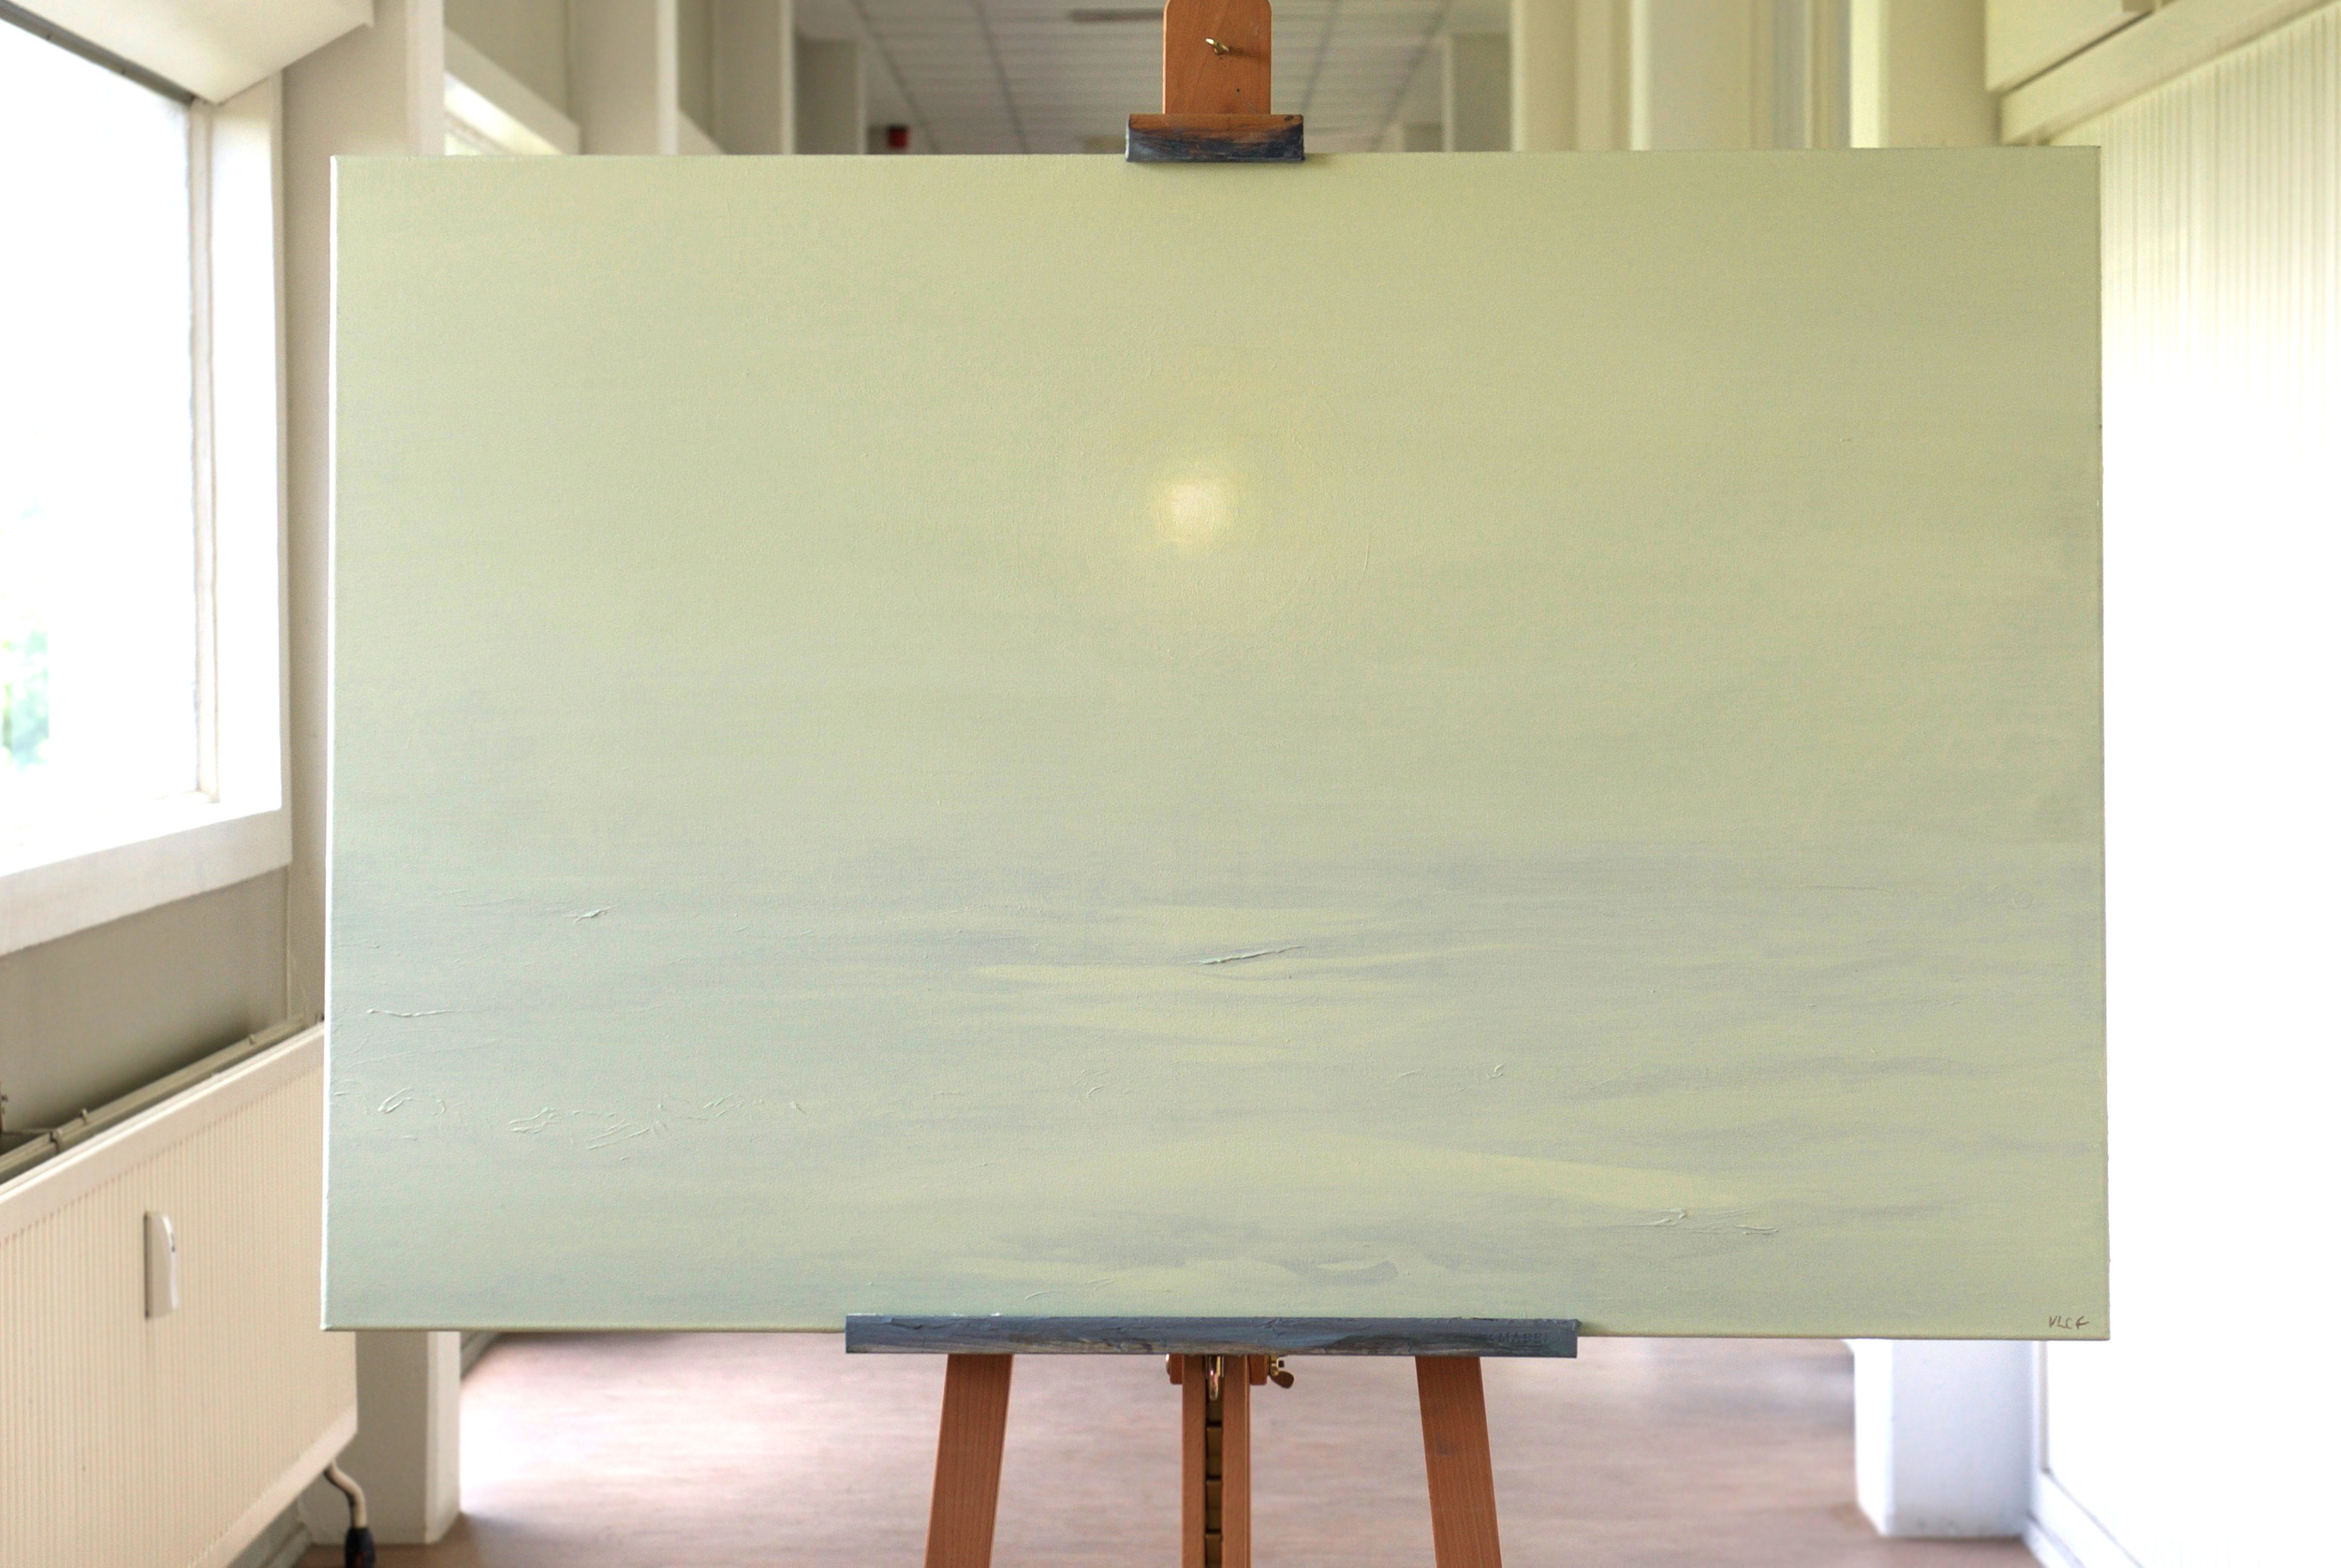 Untitled (1)